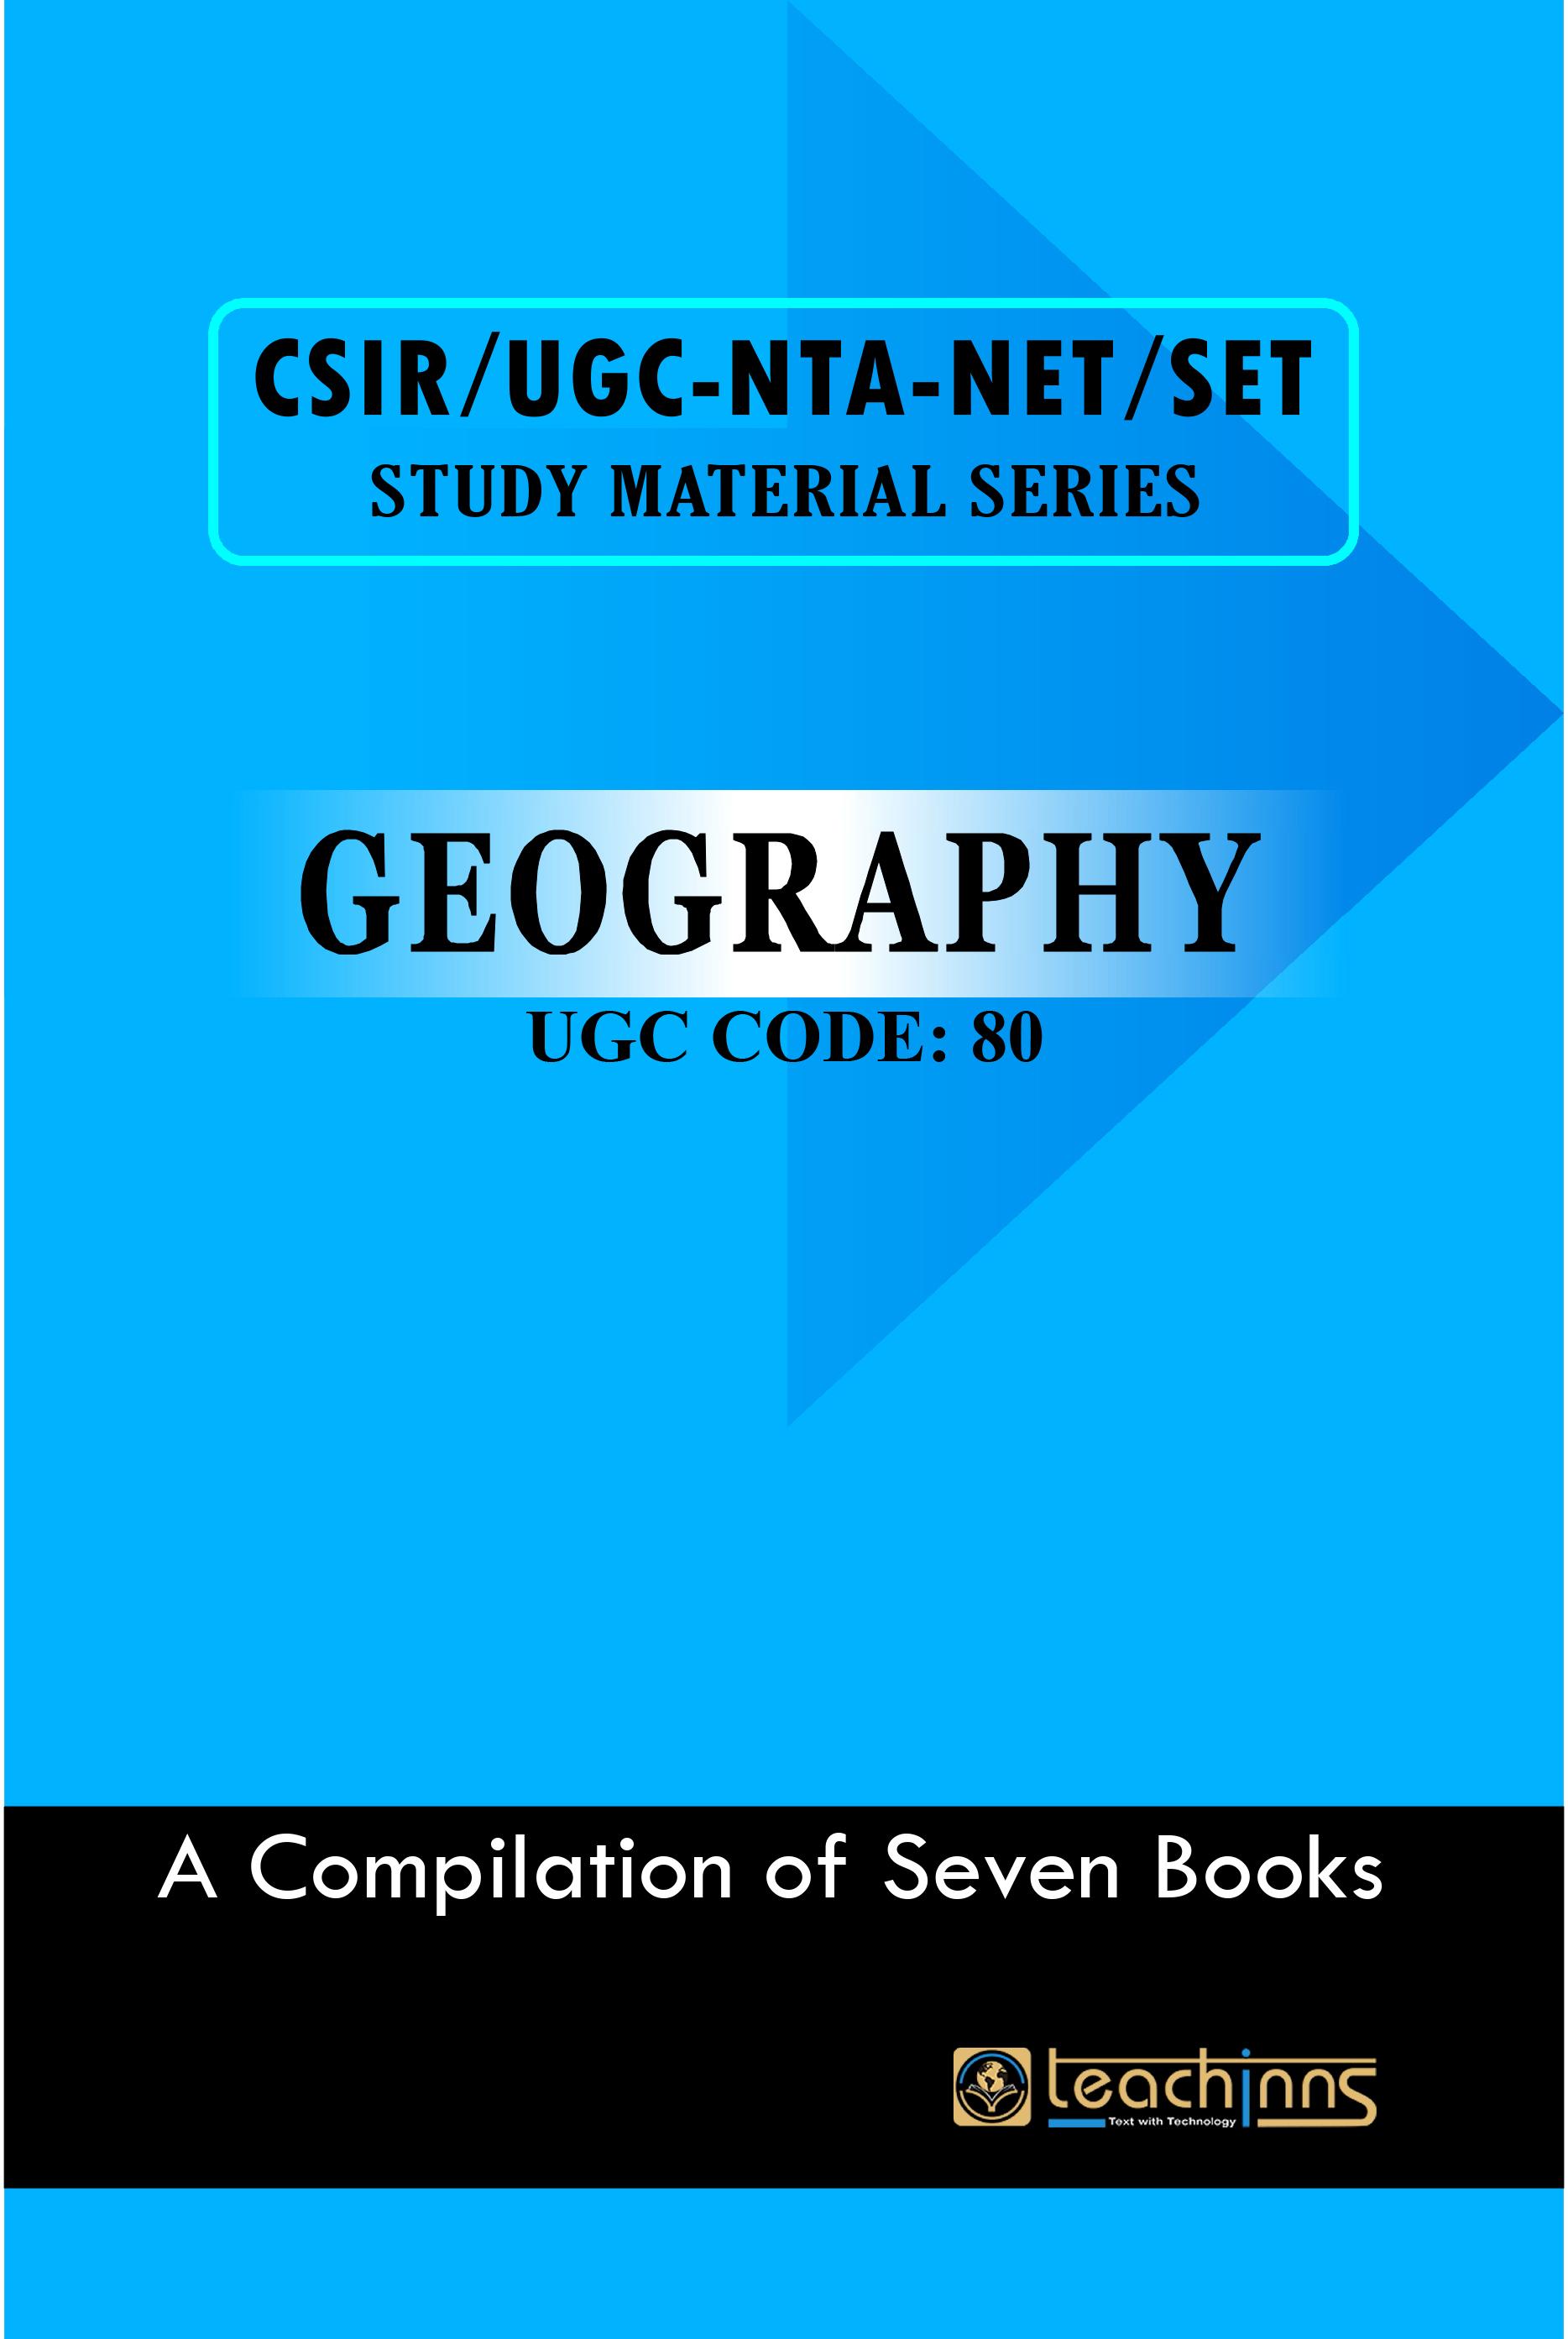 UGC-NTA NET/SET/JRF NET-Leader Geography 2020